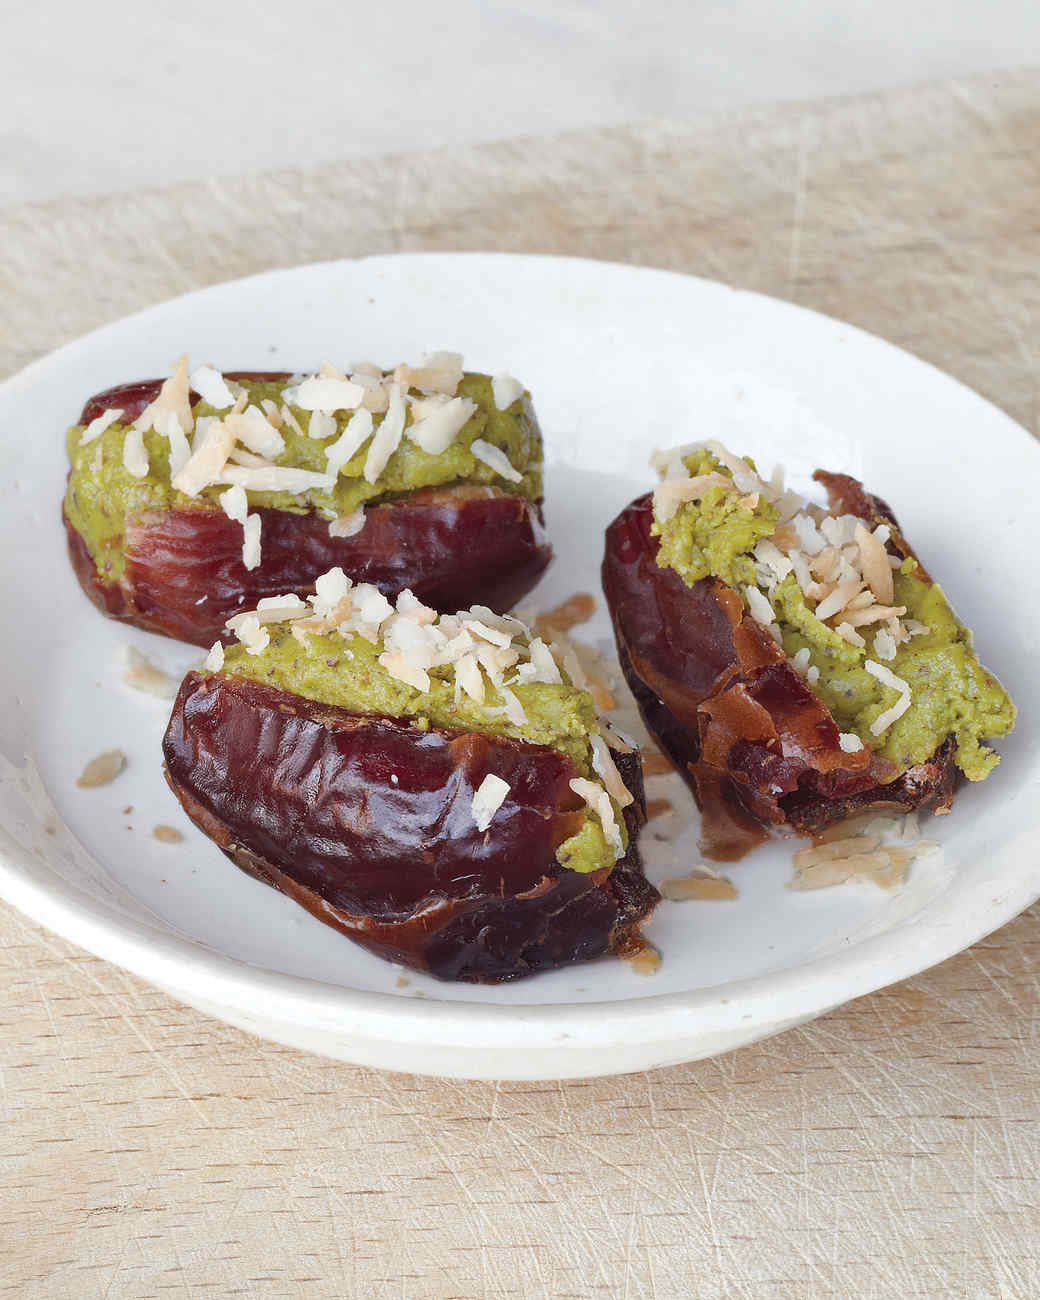 pistachio-stuffed-dates-mbd108052.jpg